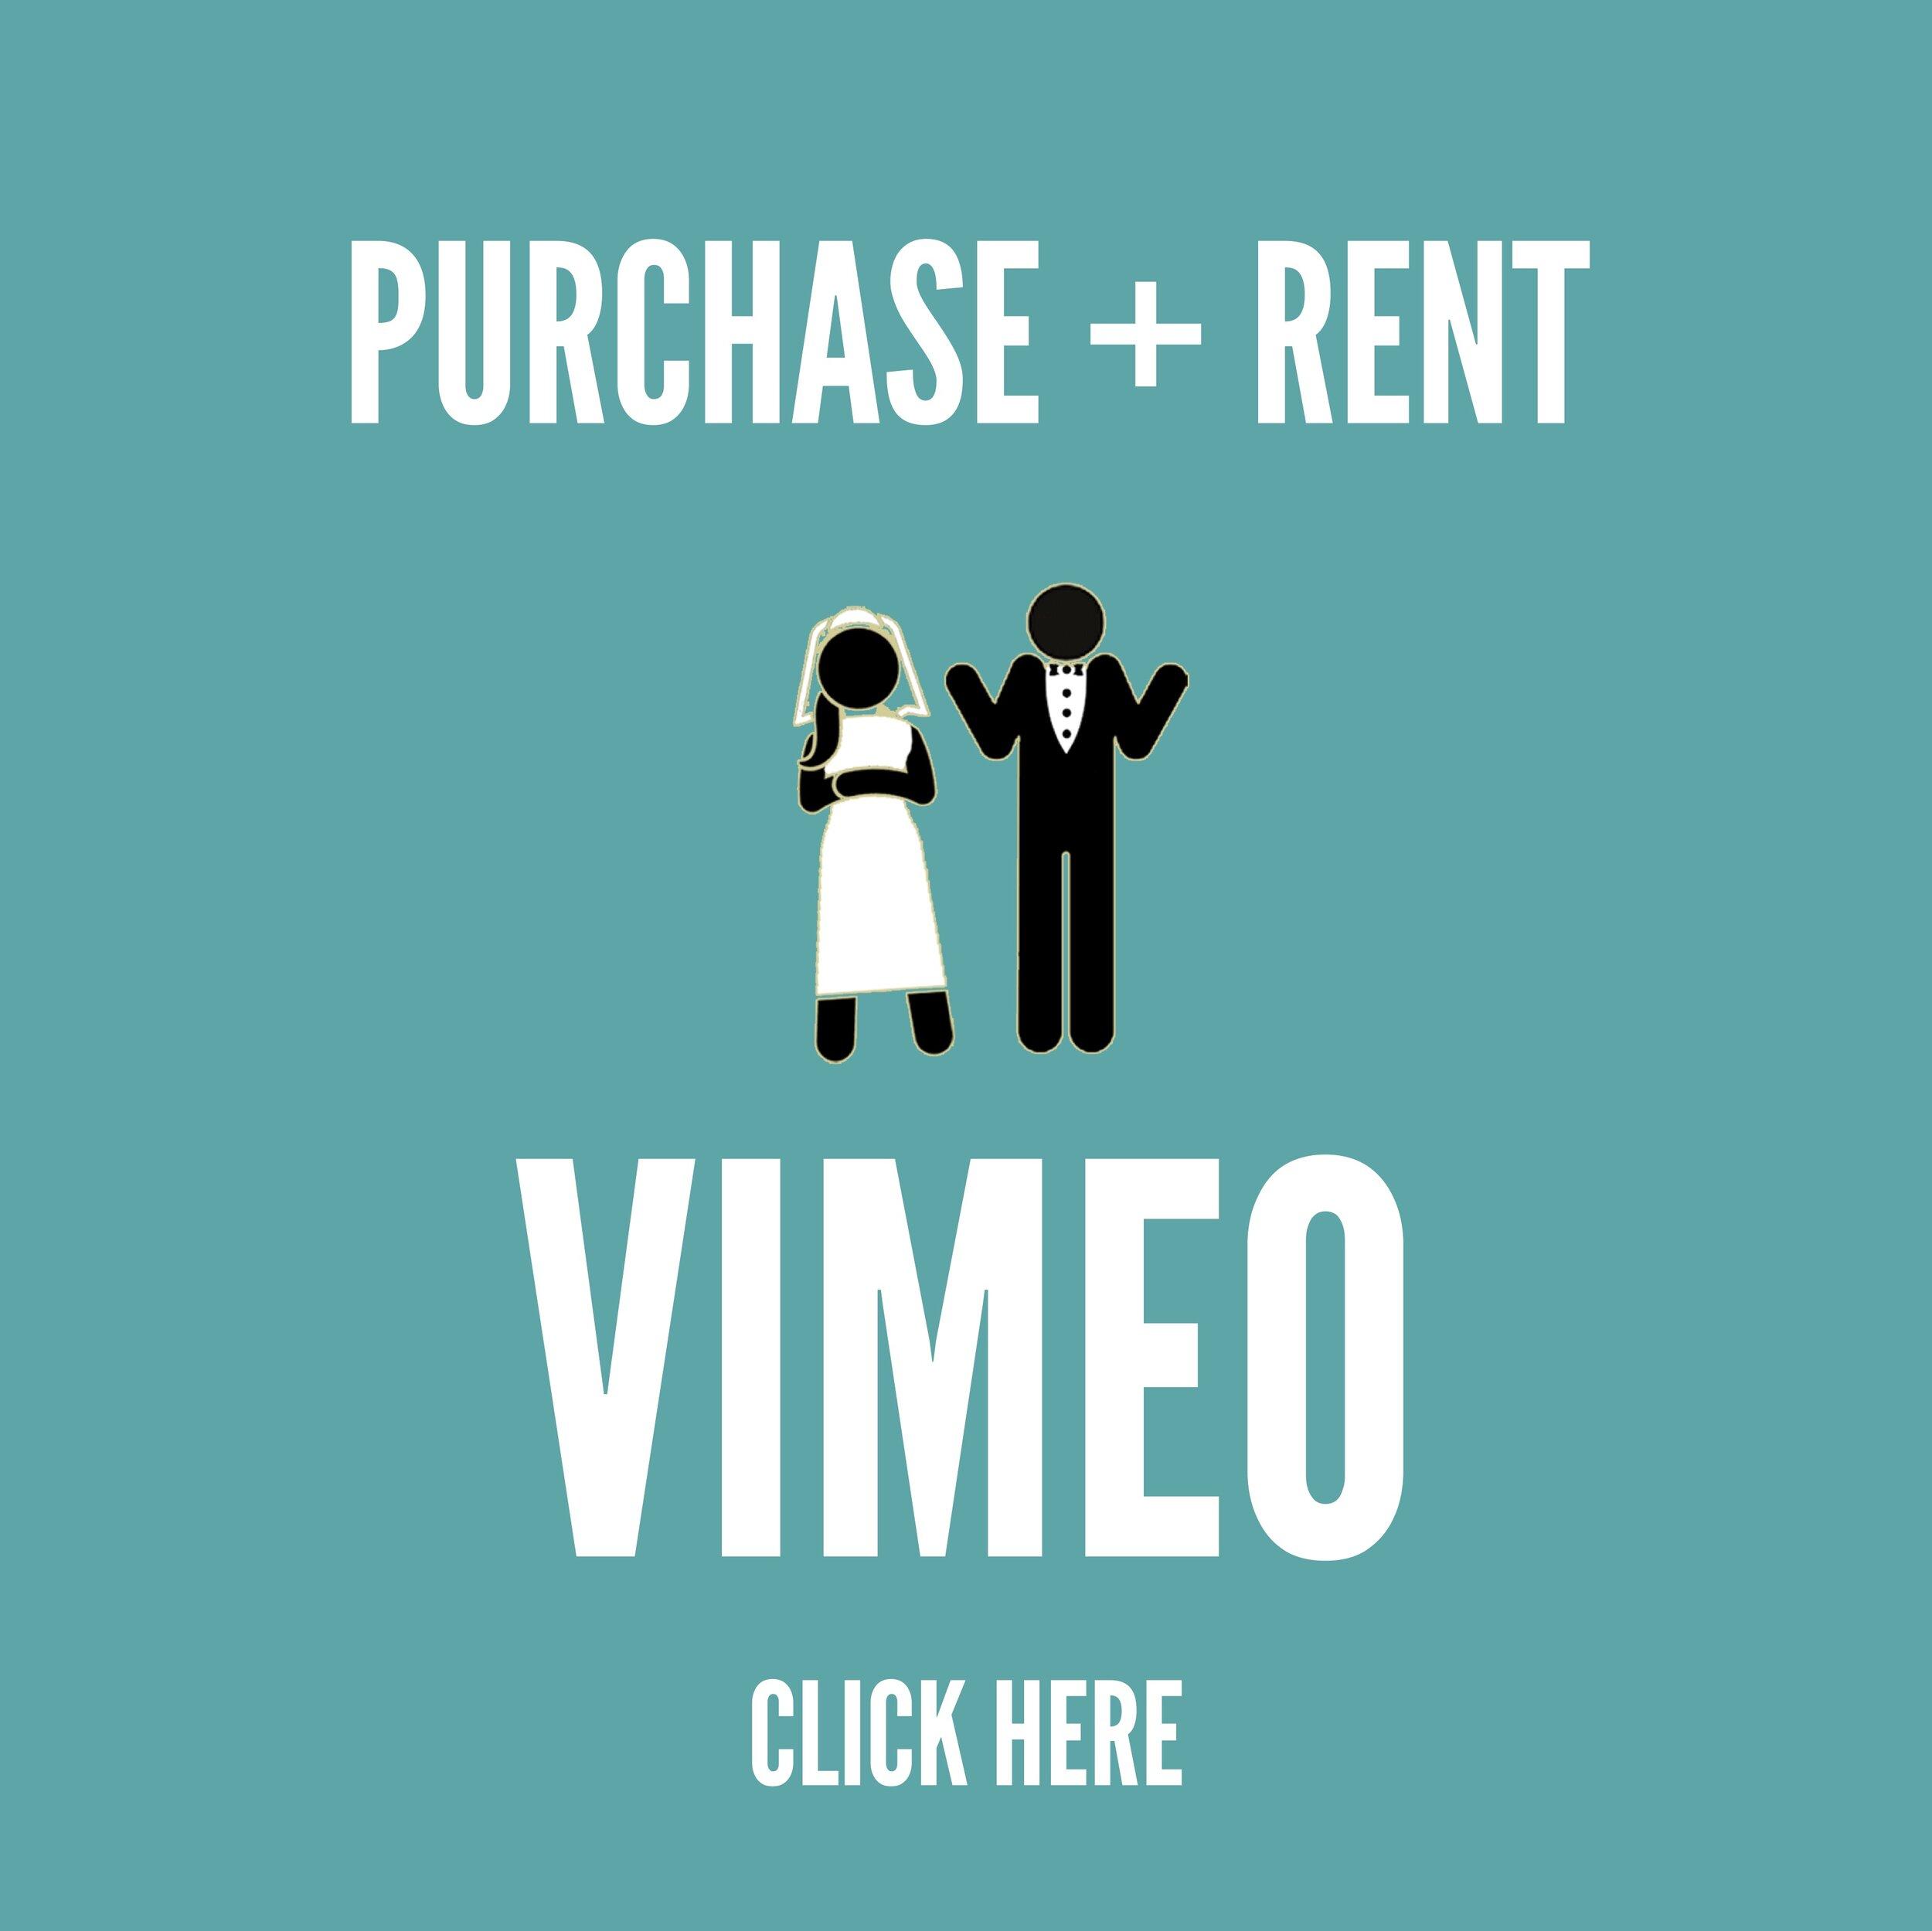 Purchase vimeo.jpg